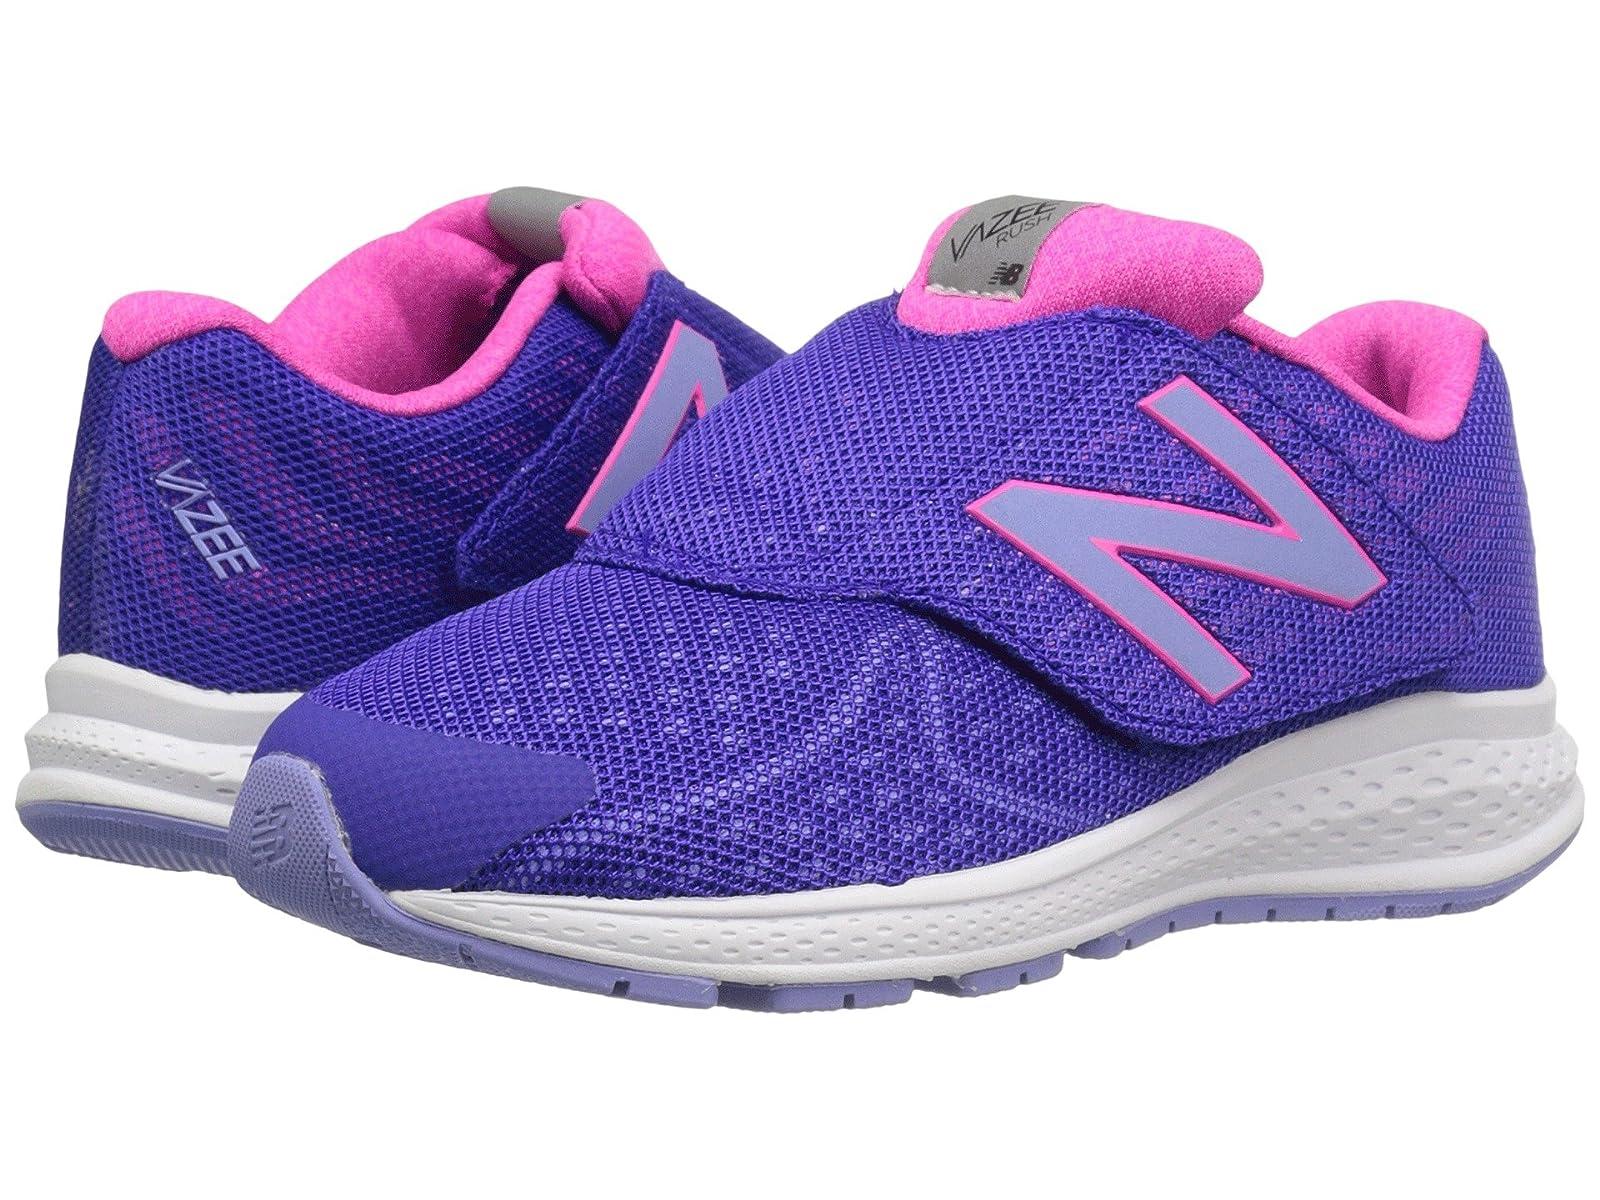 New Balance Kids Vazee Rush v2 A/C (Little Kid)Cheap and distinctive eye-catching shoes